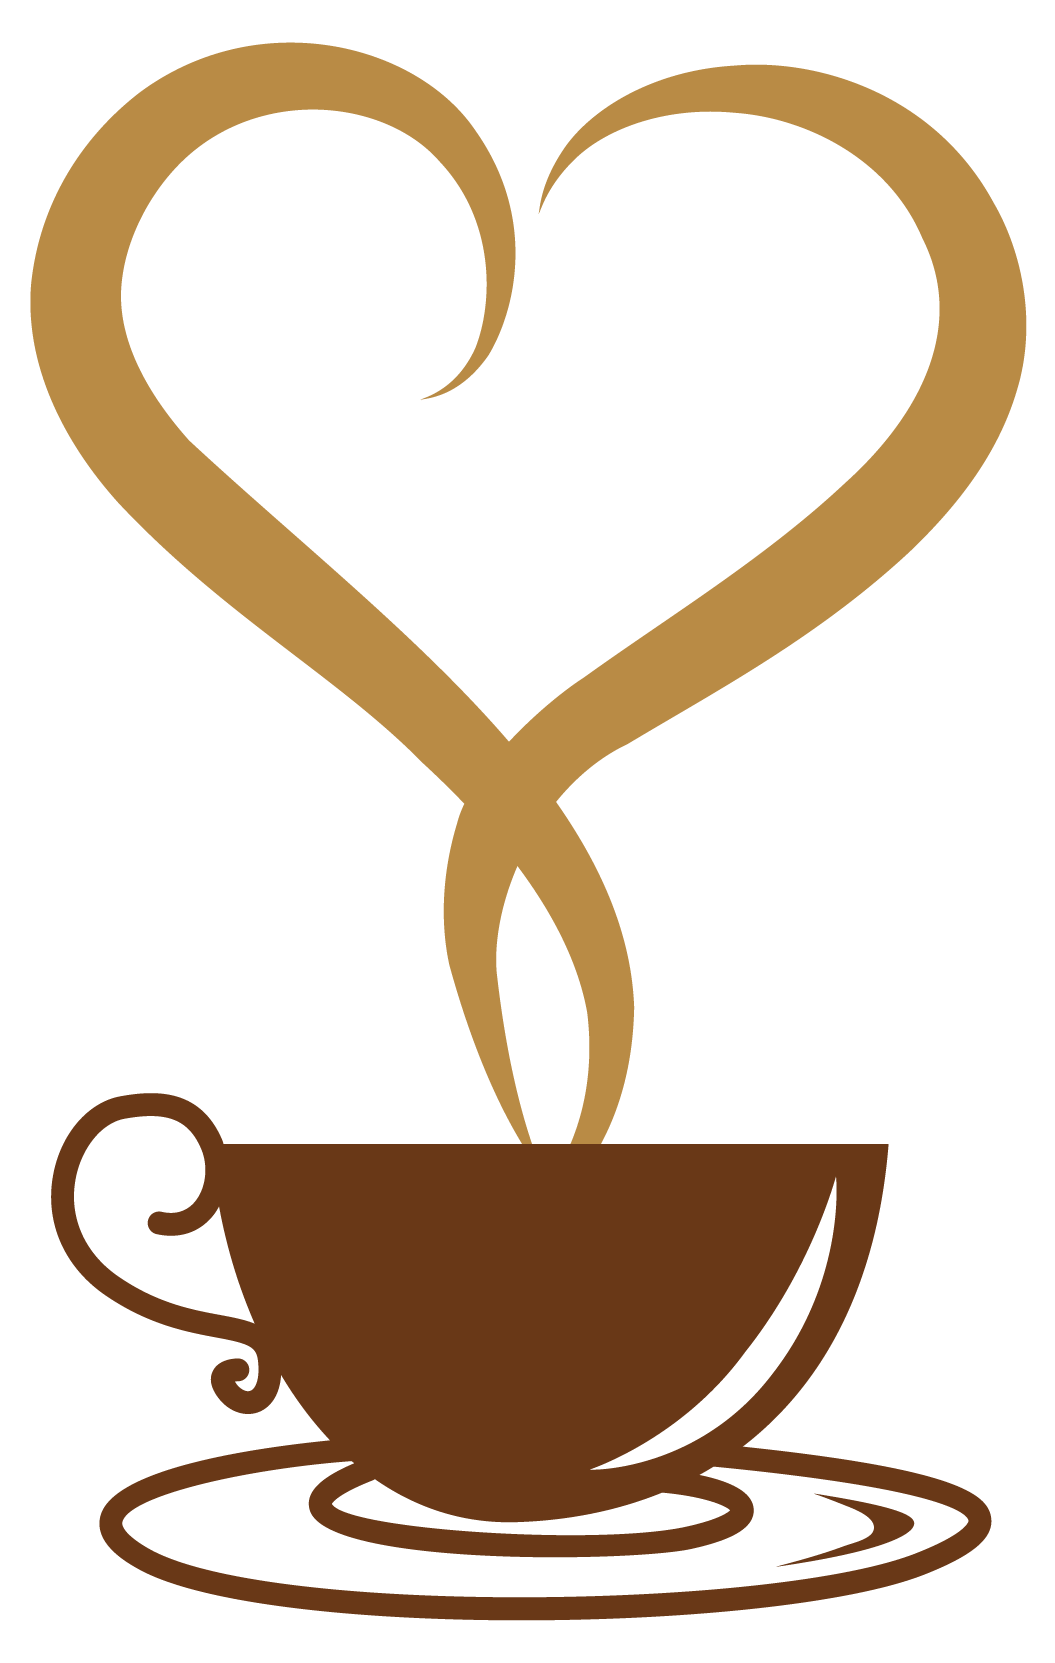 vector freeuse download Coffee Mug With Heart PNG Transparent Coffee Mug With Heart